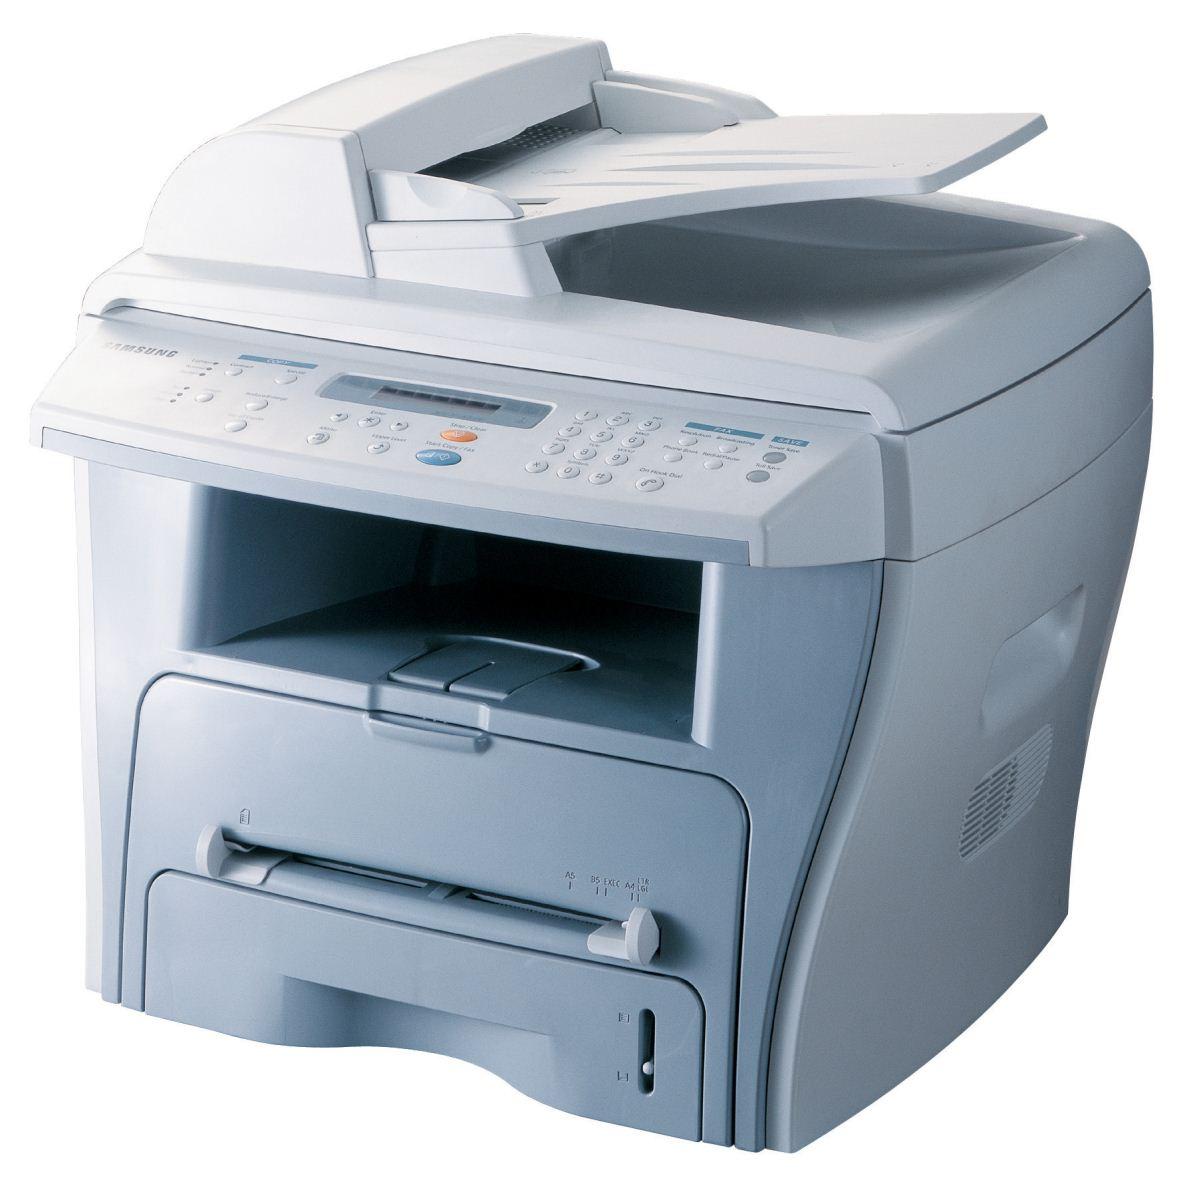 Máy in Samsung SCX 4216F, In, Scan, Copy, Fax, Laser trắng đen